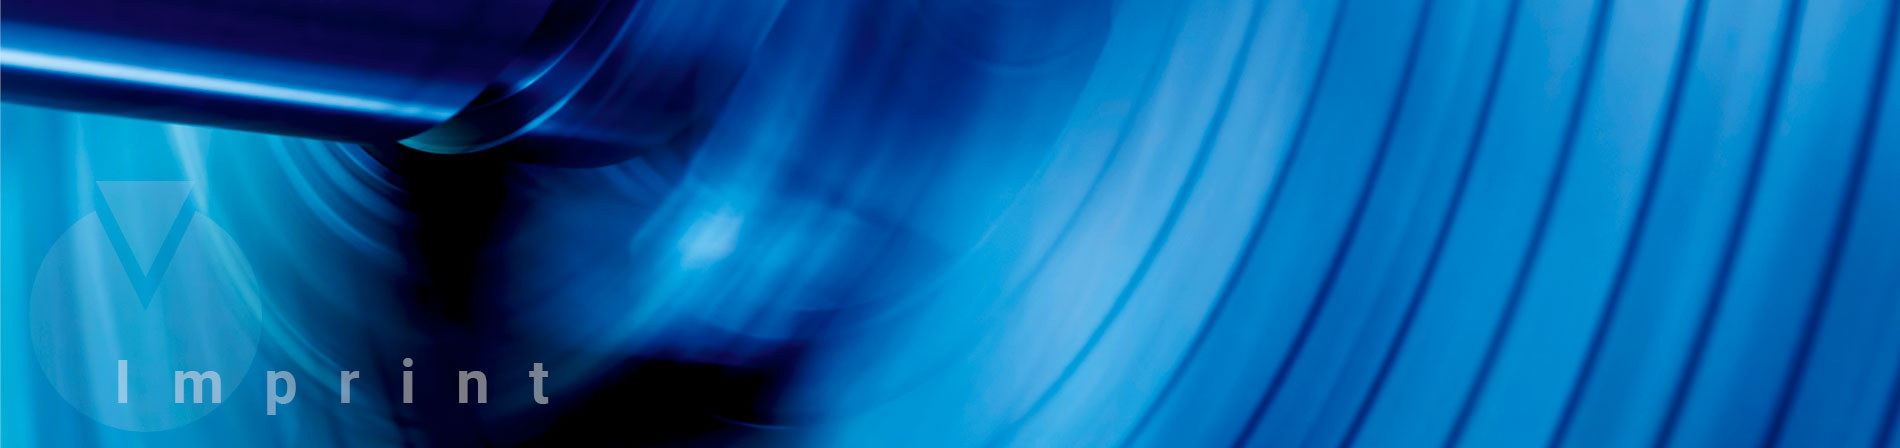 transco-audrema-automatic-lathes-imprint